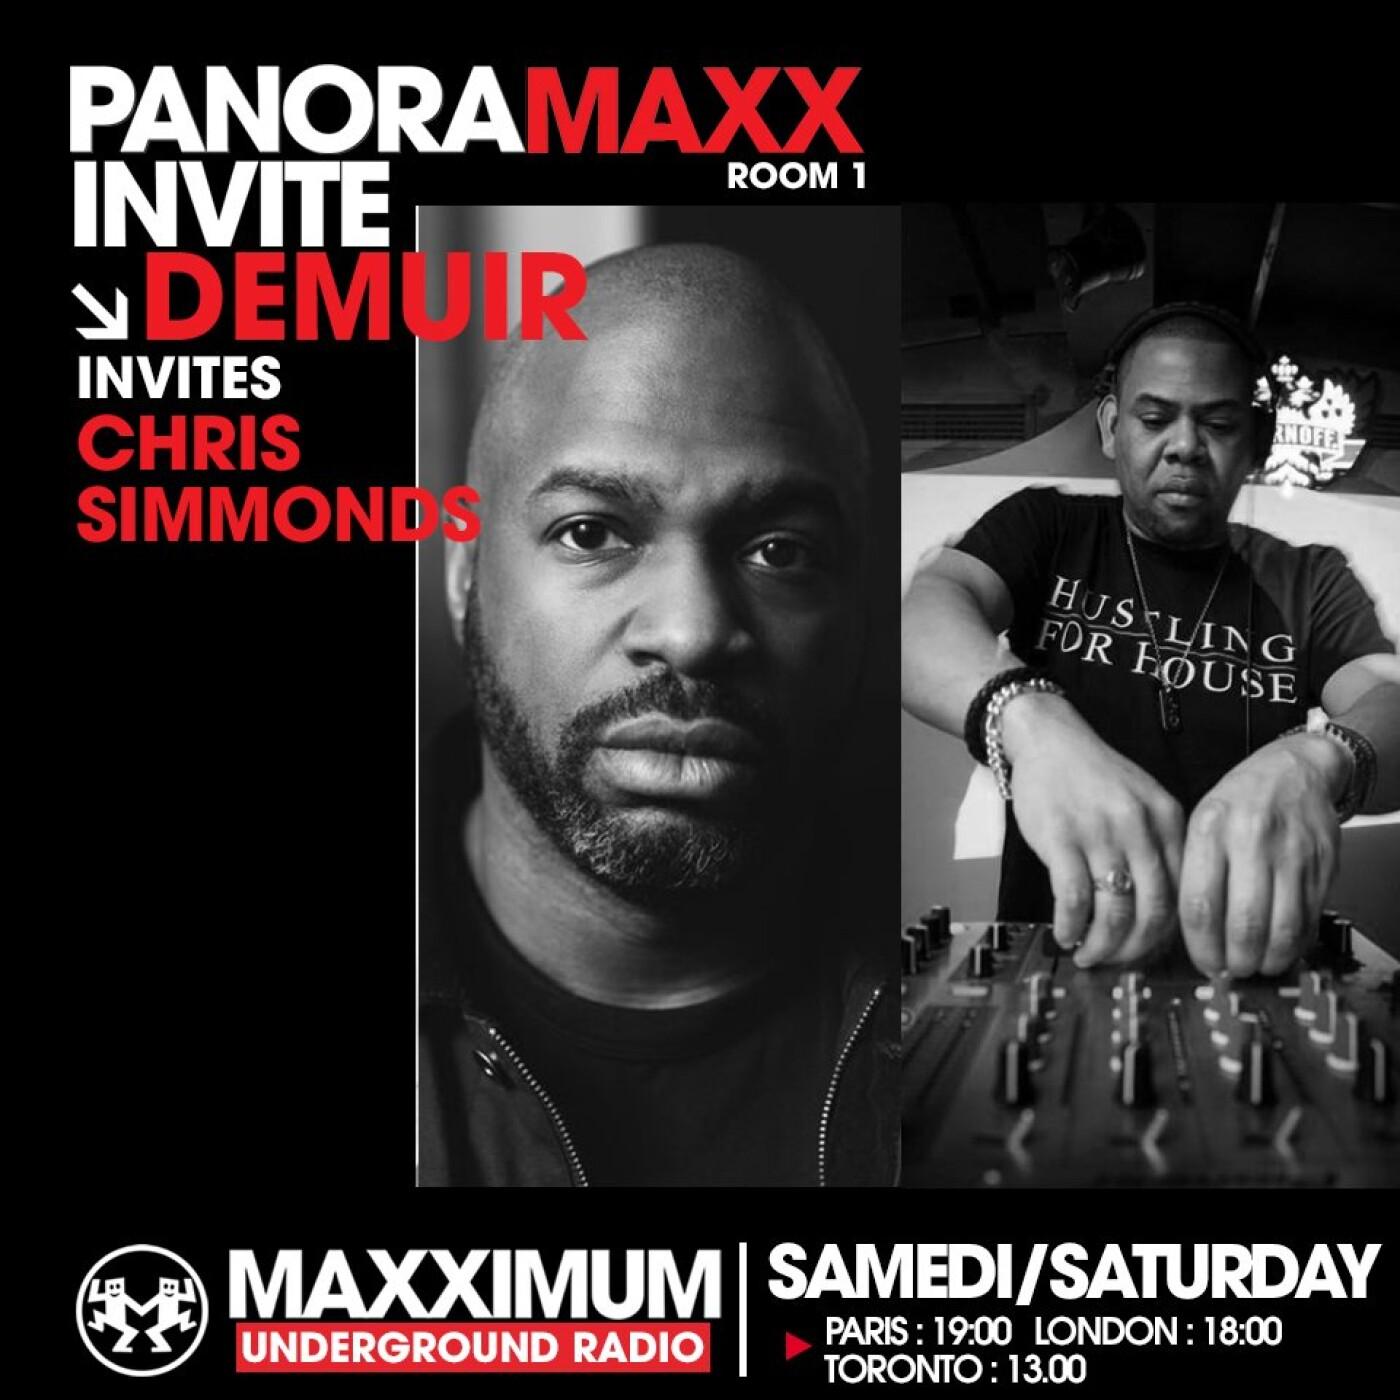 PANORAMAXX : CHRIS SIMMONDS